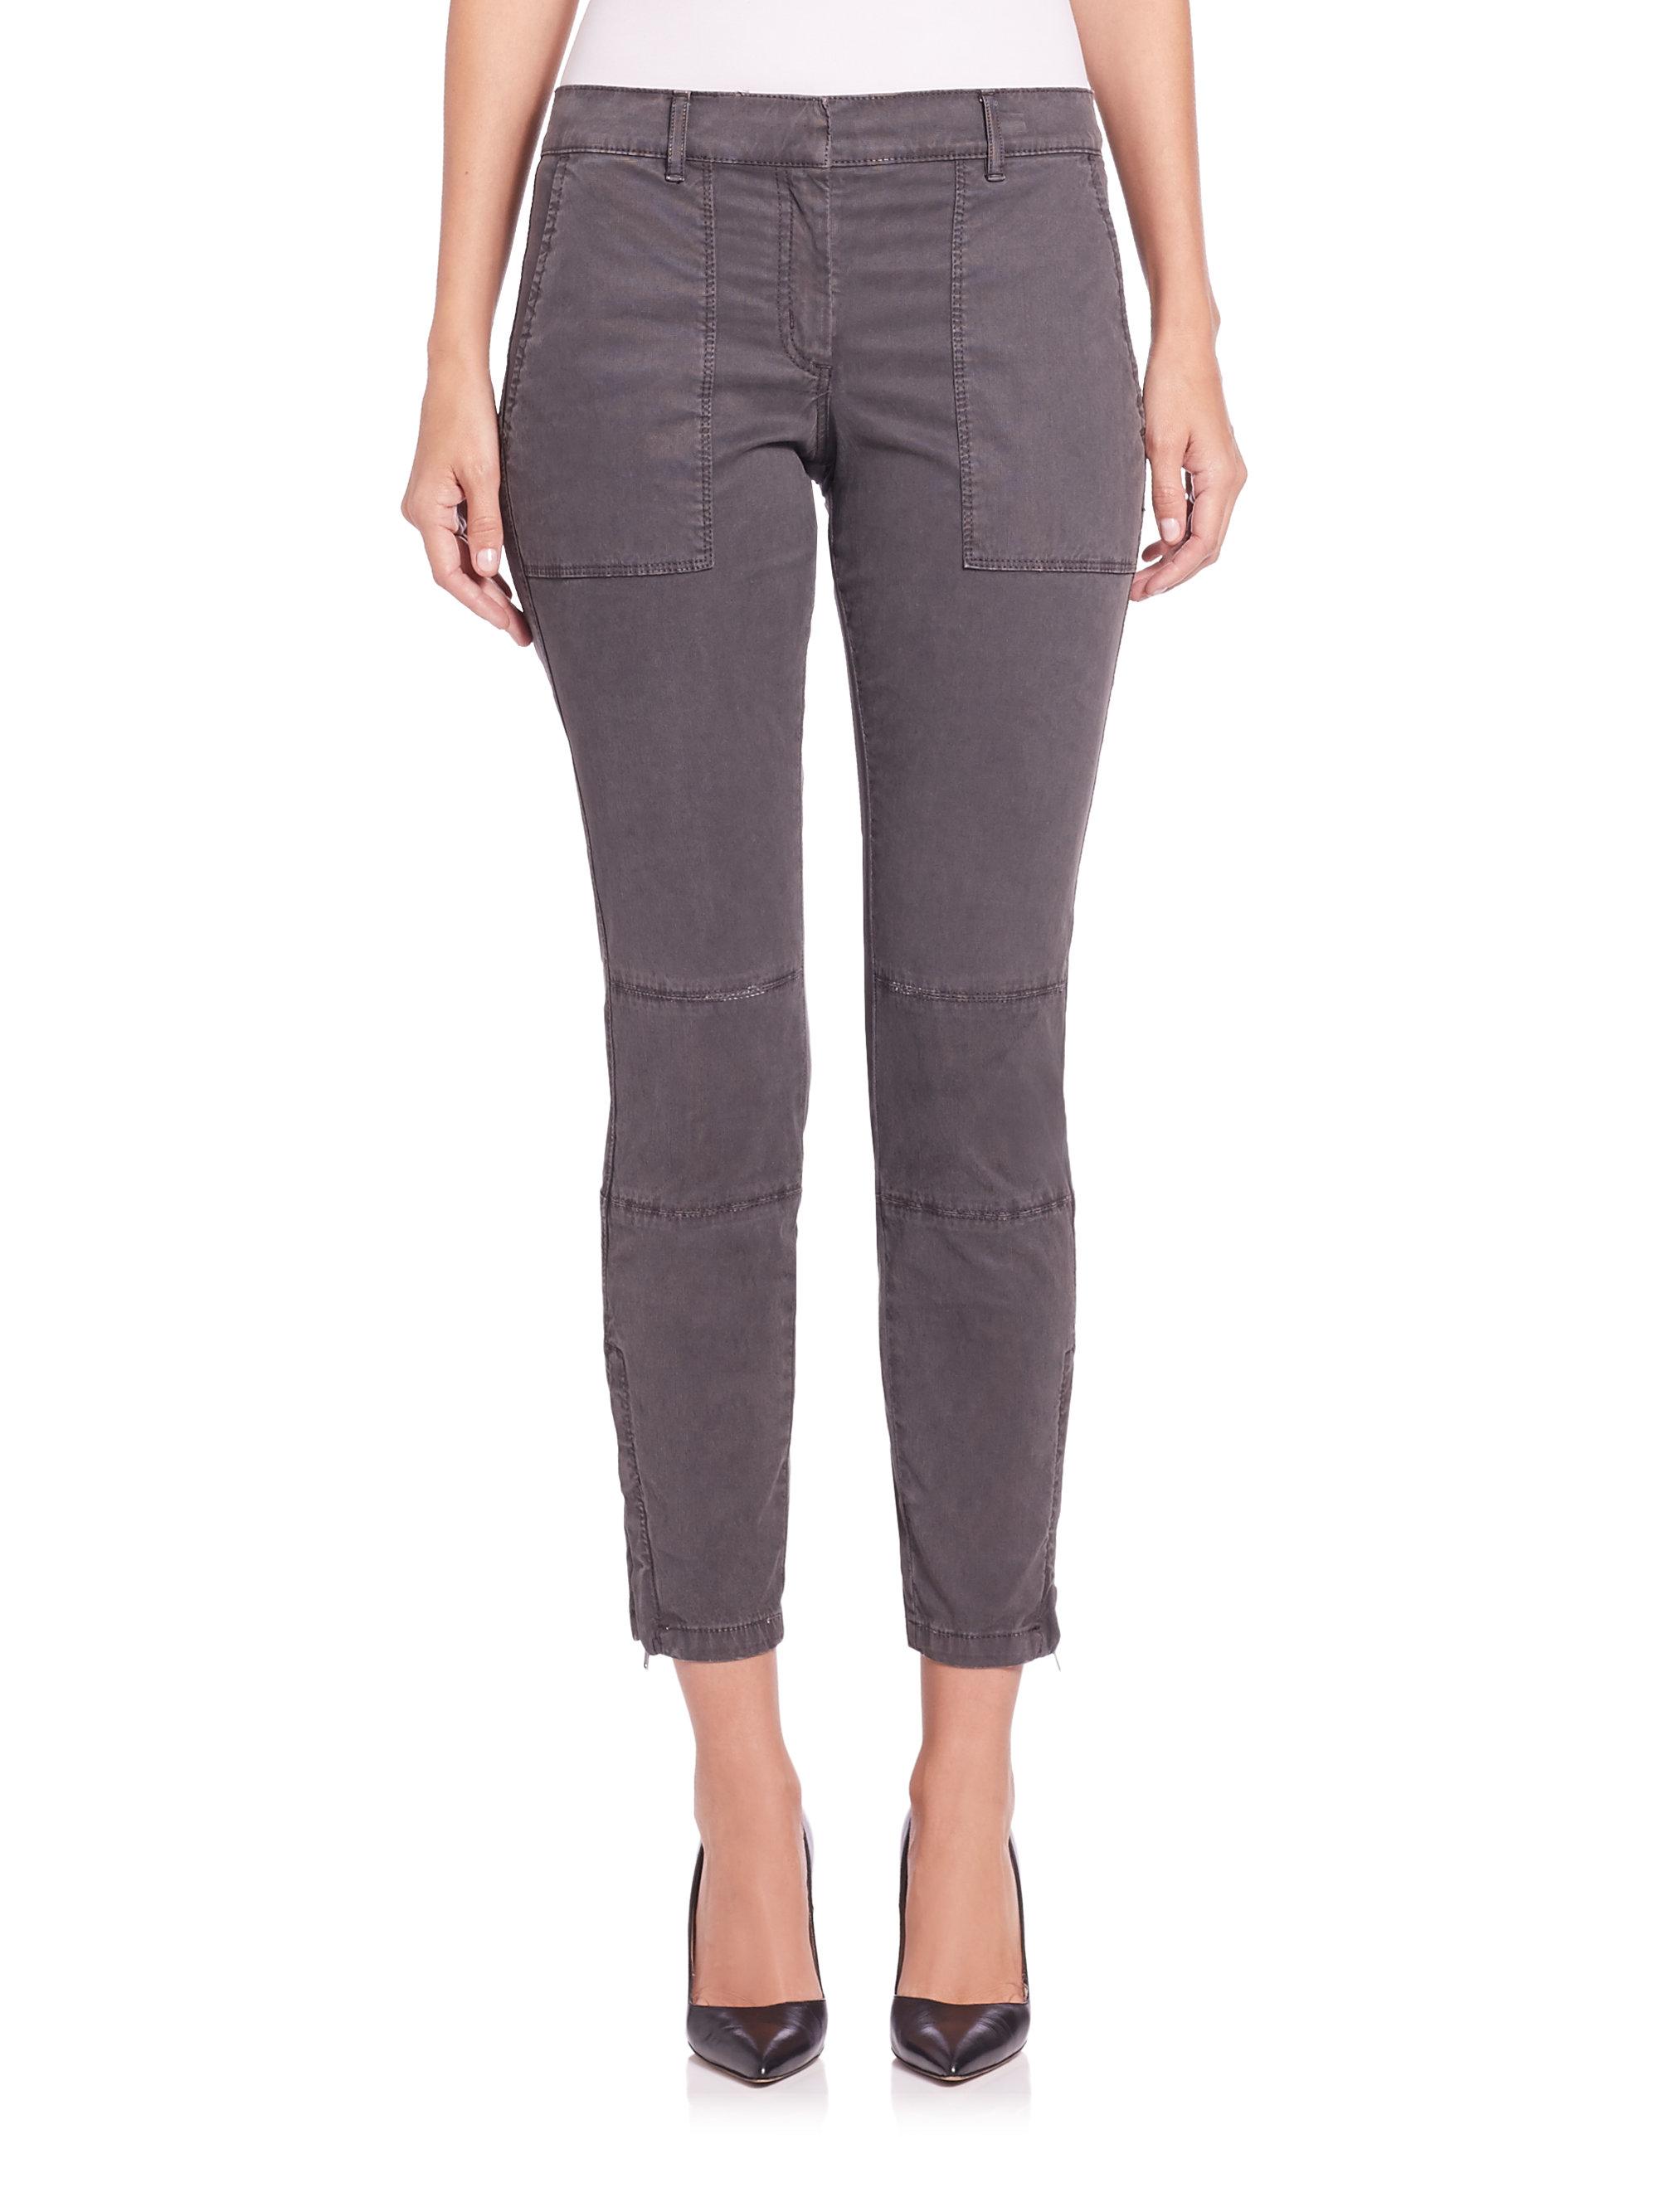 Creative Napapijri Cargo Pants In Gray Grey  Lyst